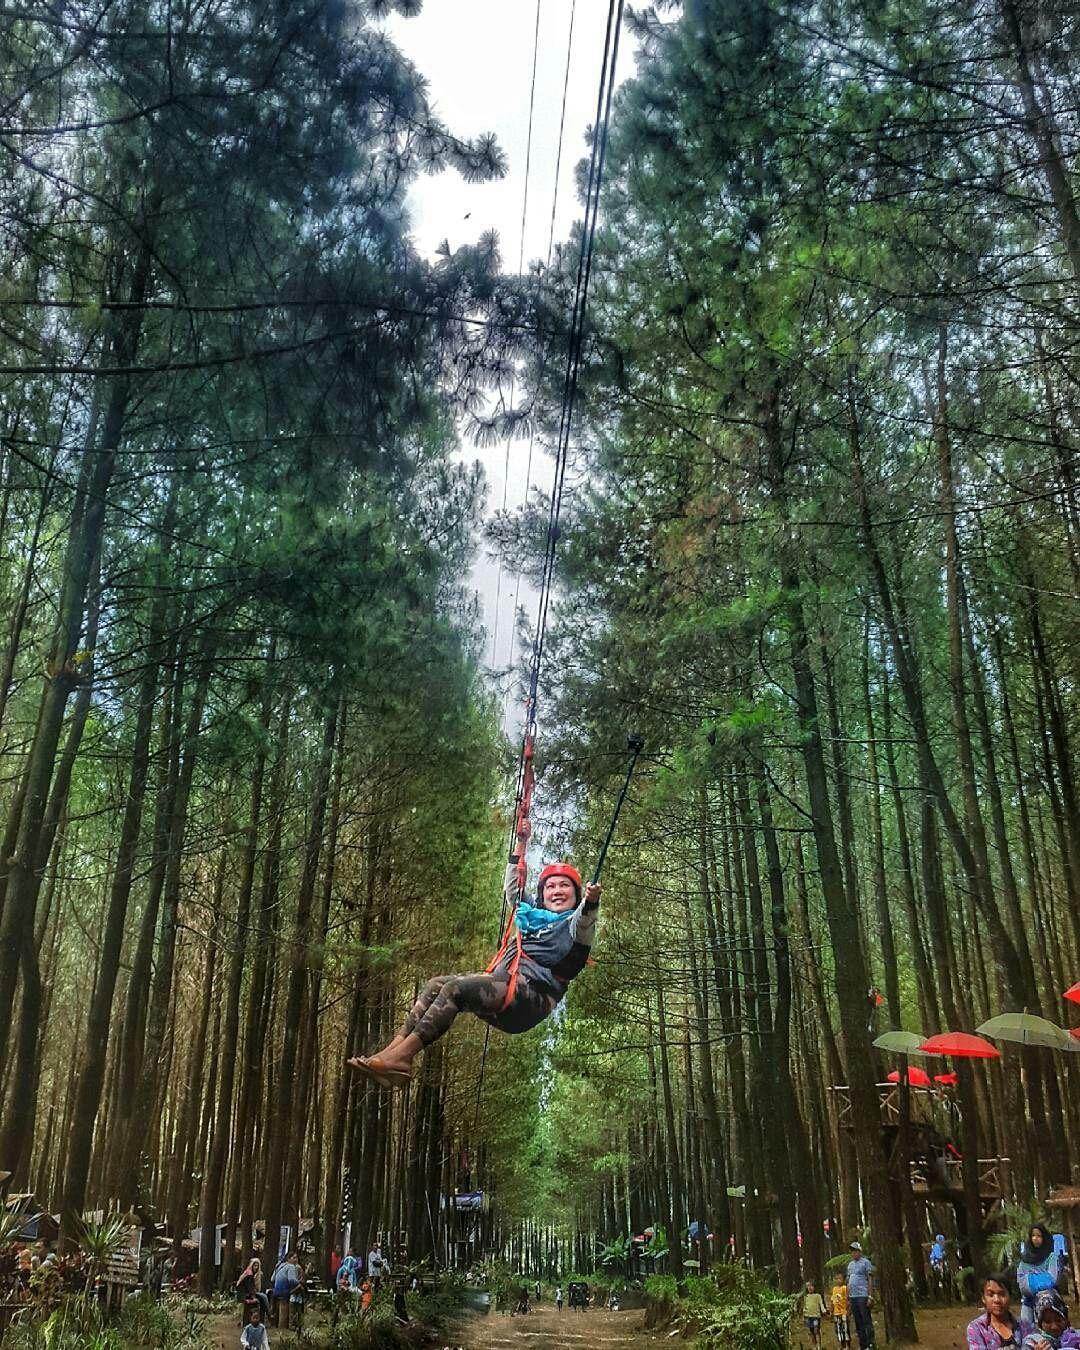 Hutan Pinus Malang : hutan, pinus, malang, Hutan, Pinus, Semeru, Malang, Hutan,, Malang,, Liburan